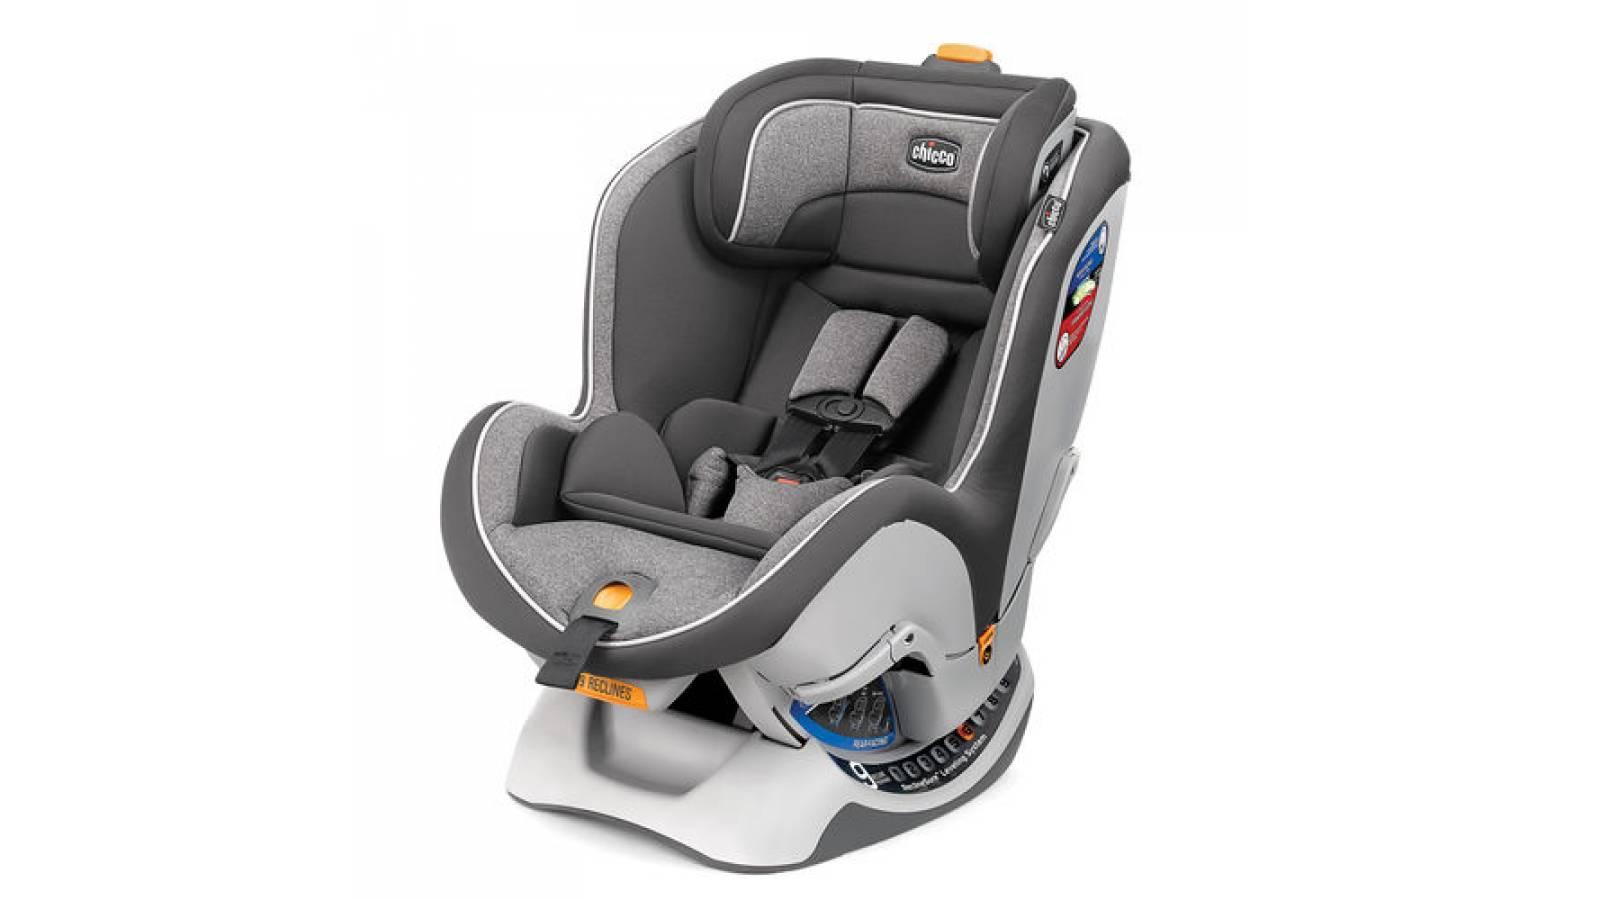 NEXTFIT CONVERTIBLE CAR SEAT JASPER